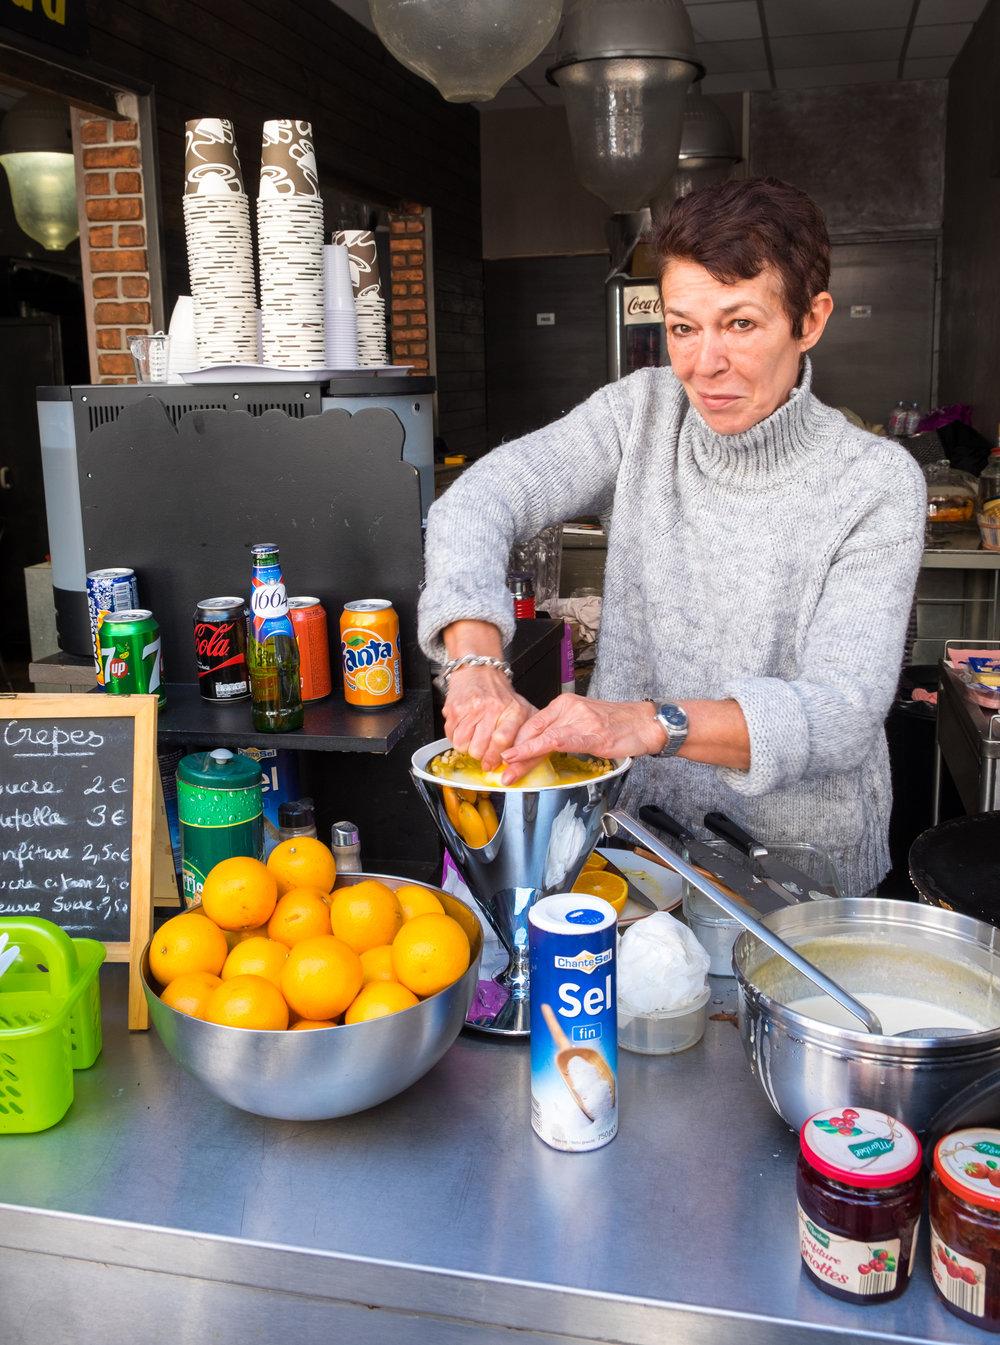 Fresh-squeezed orange juice.